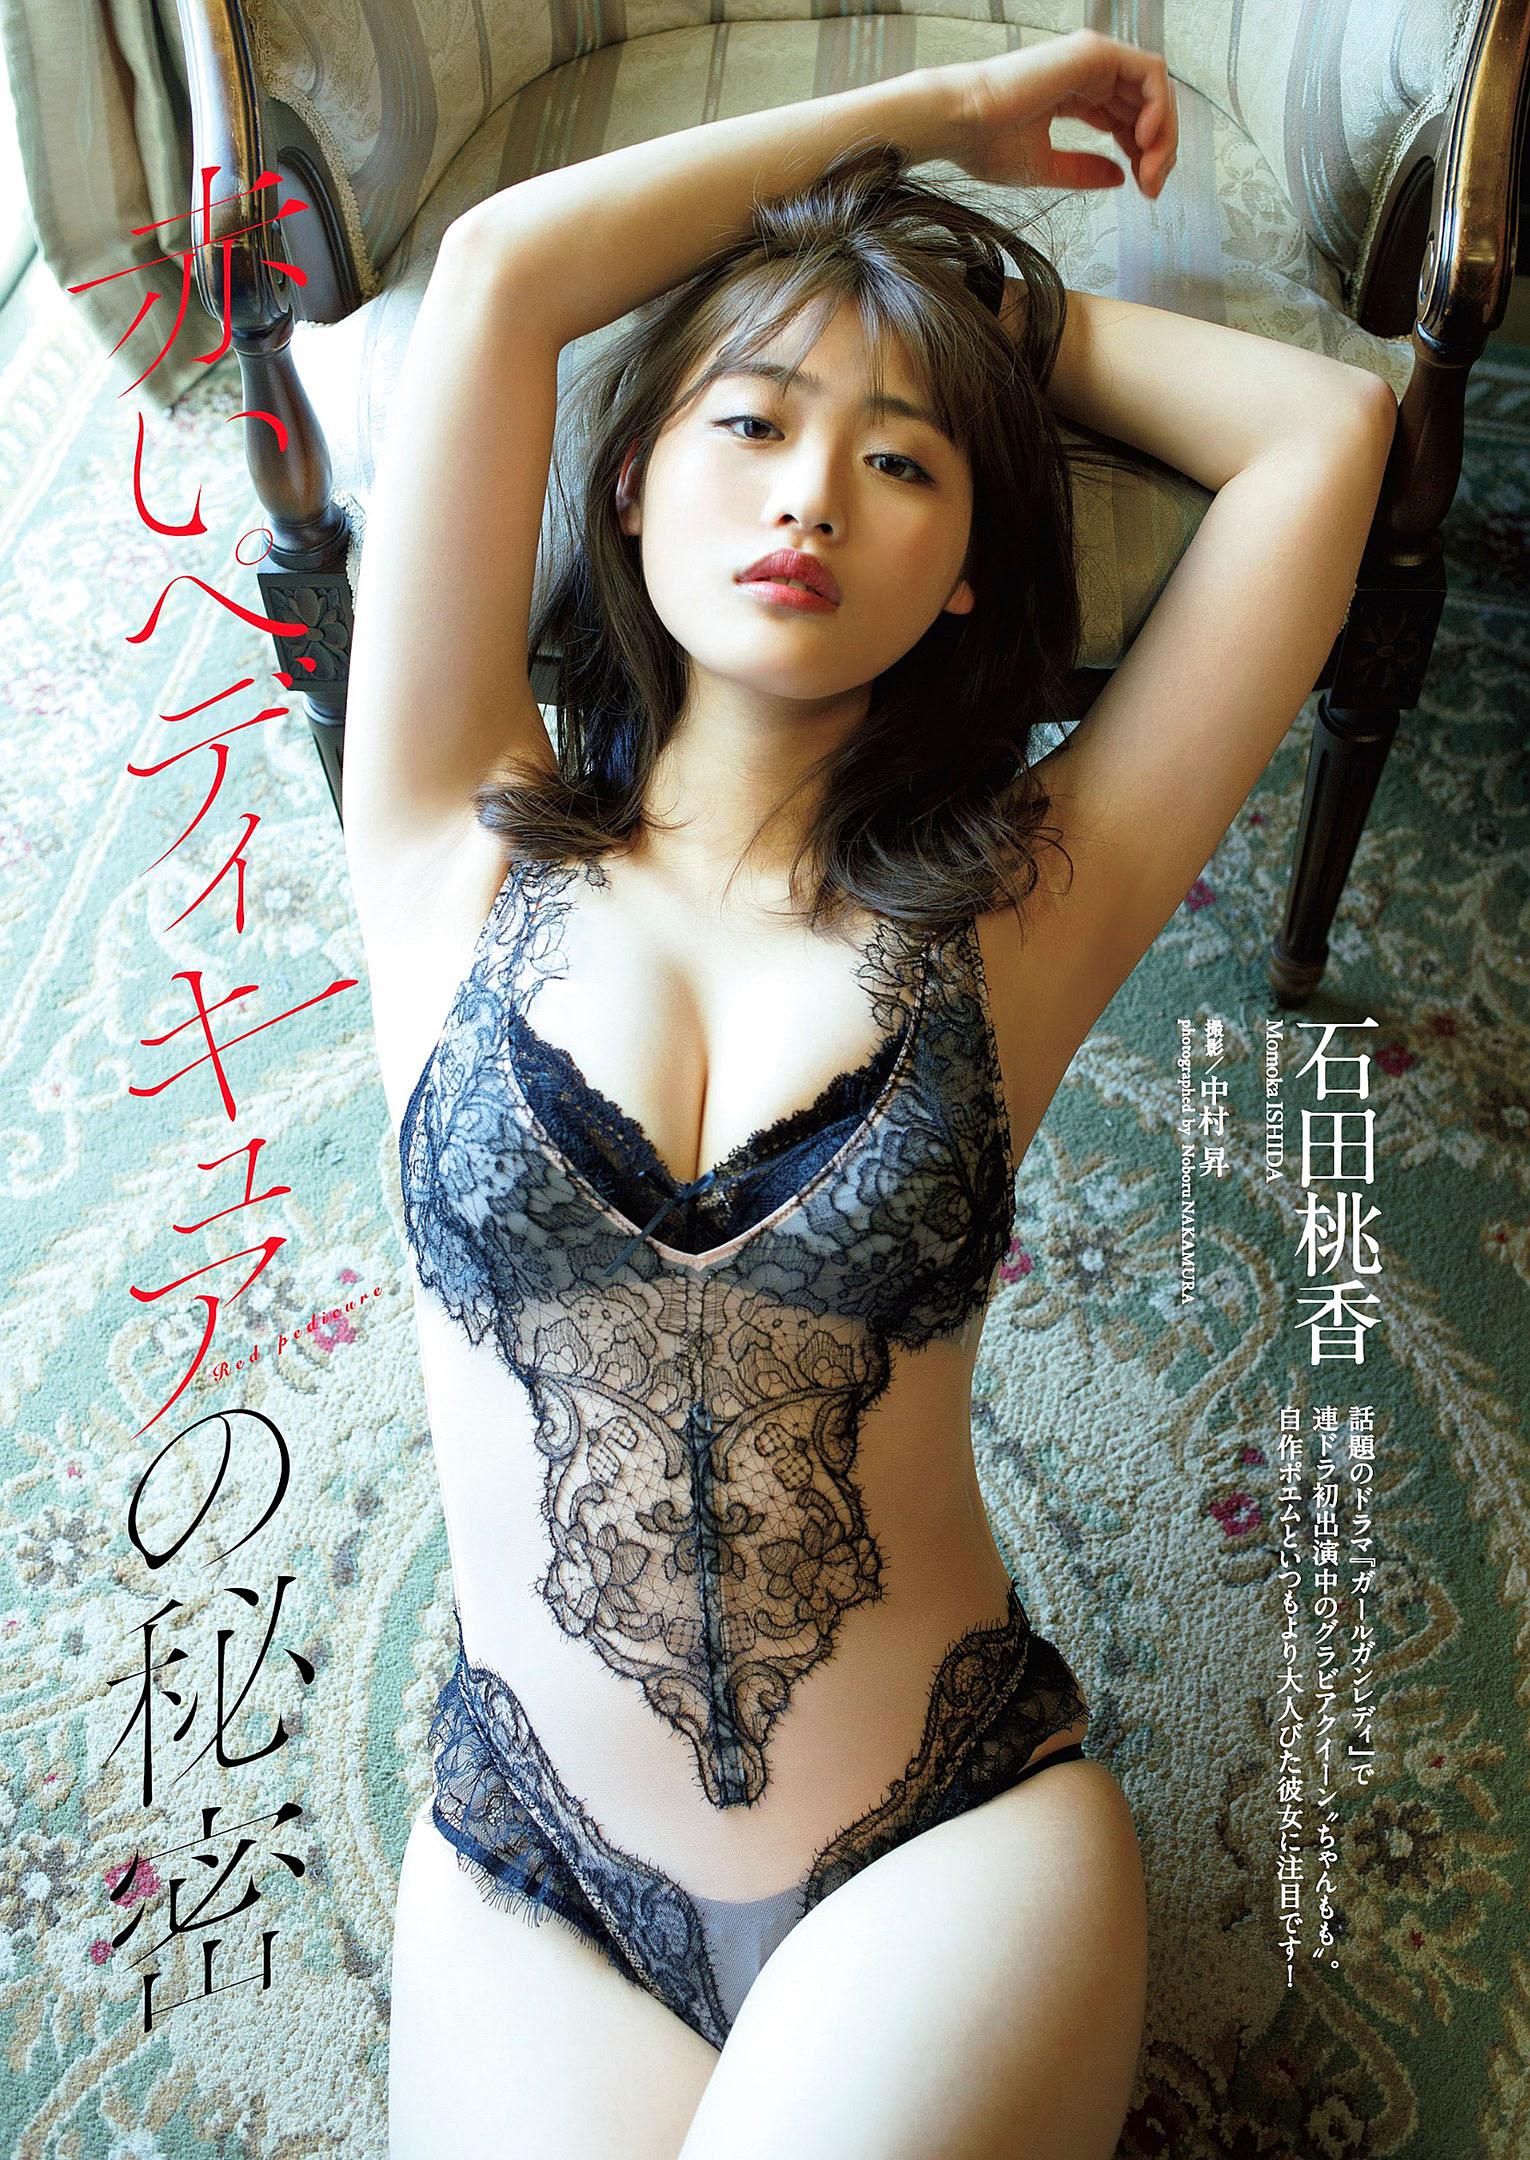 Ishida Momoka WPB 210503 01.jpg